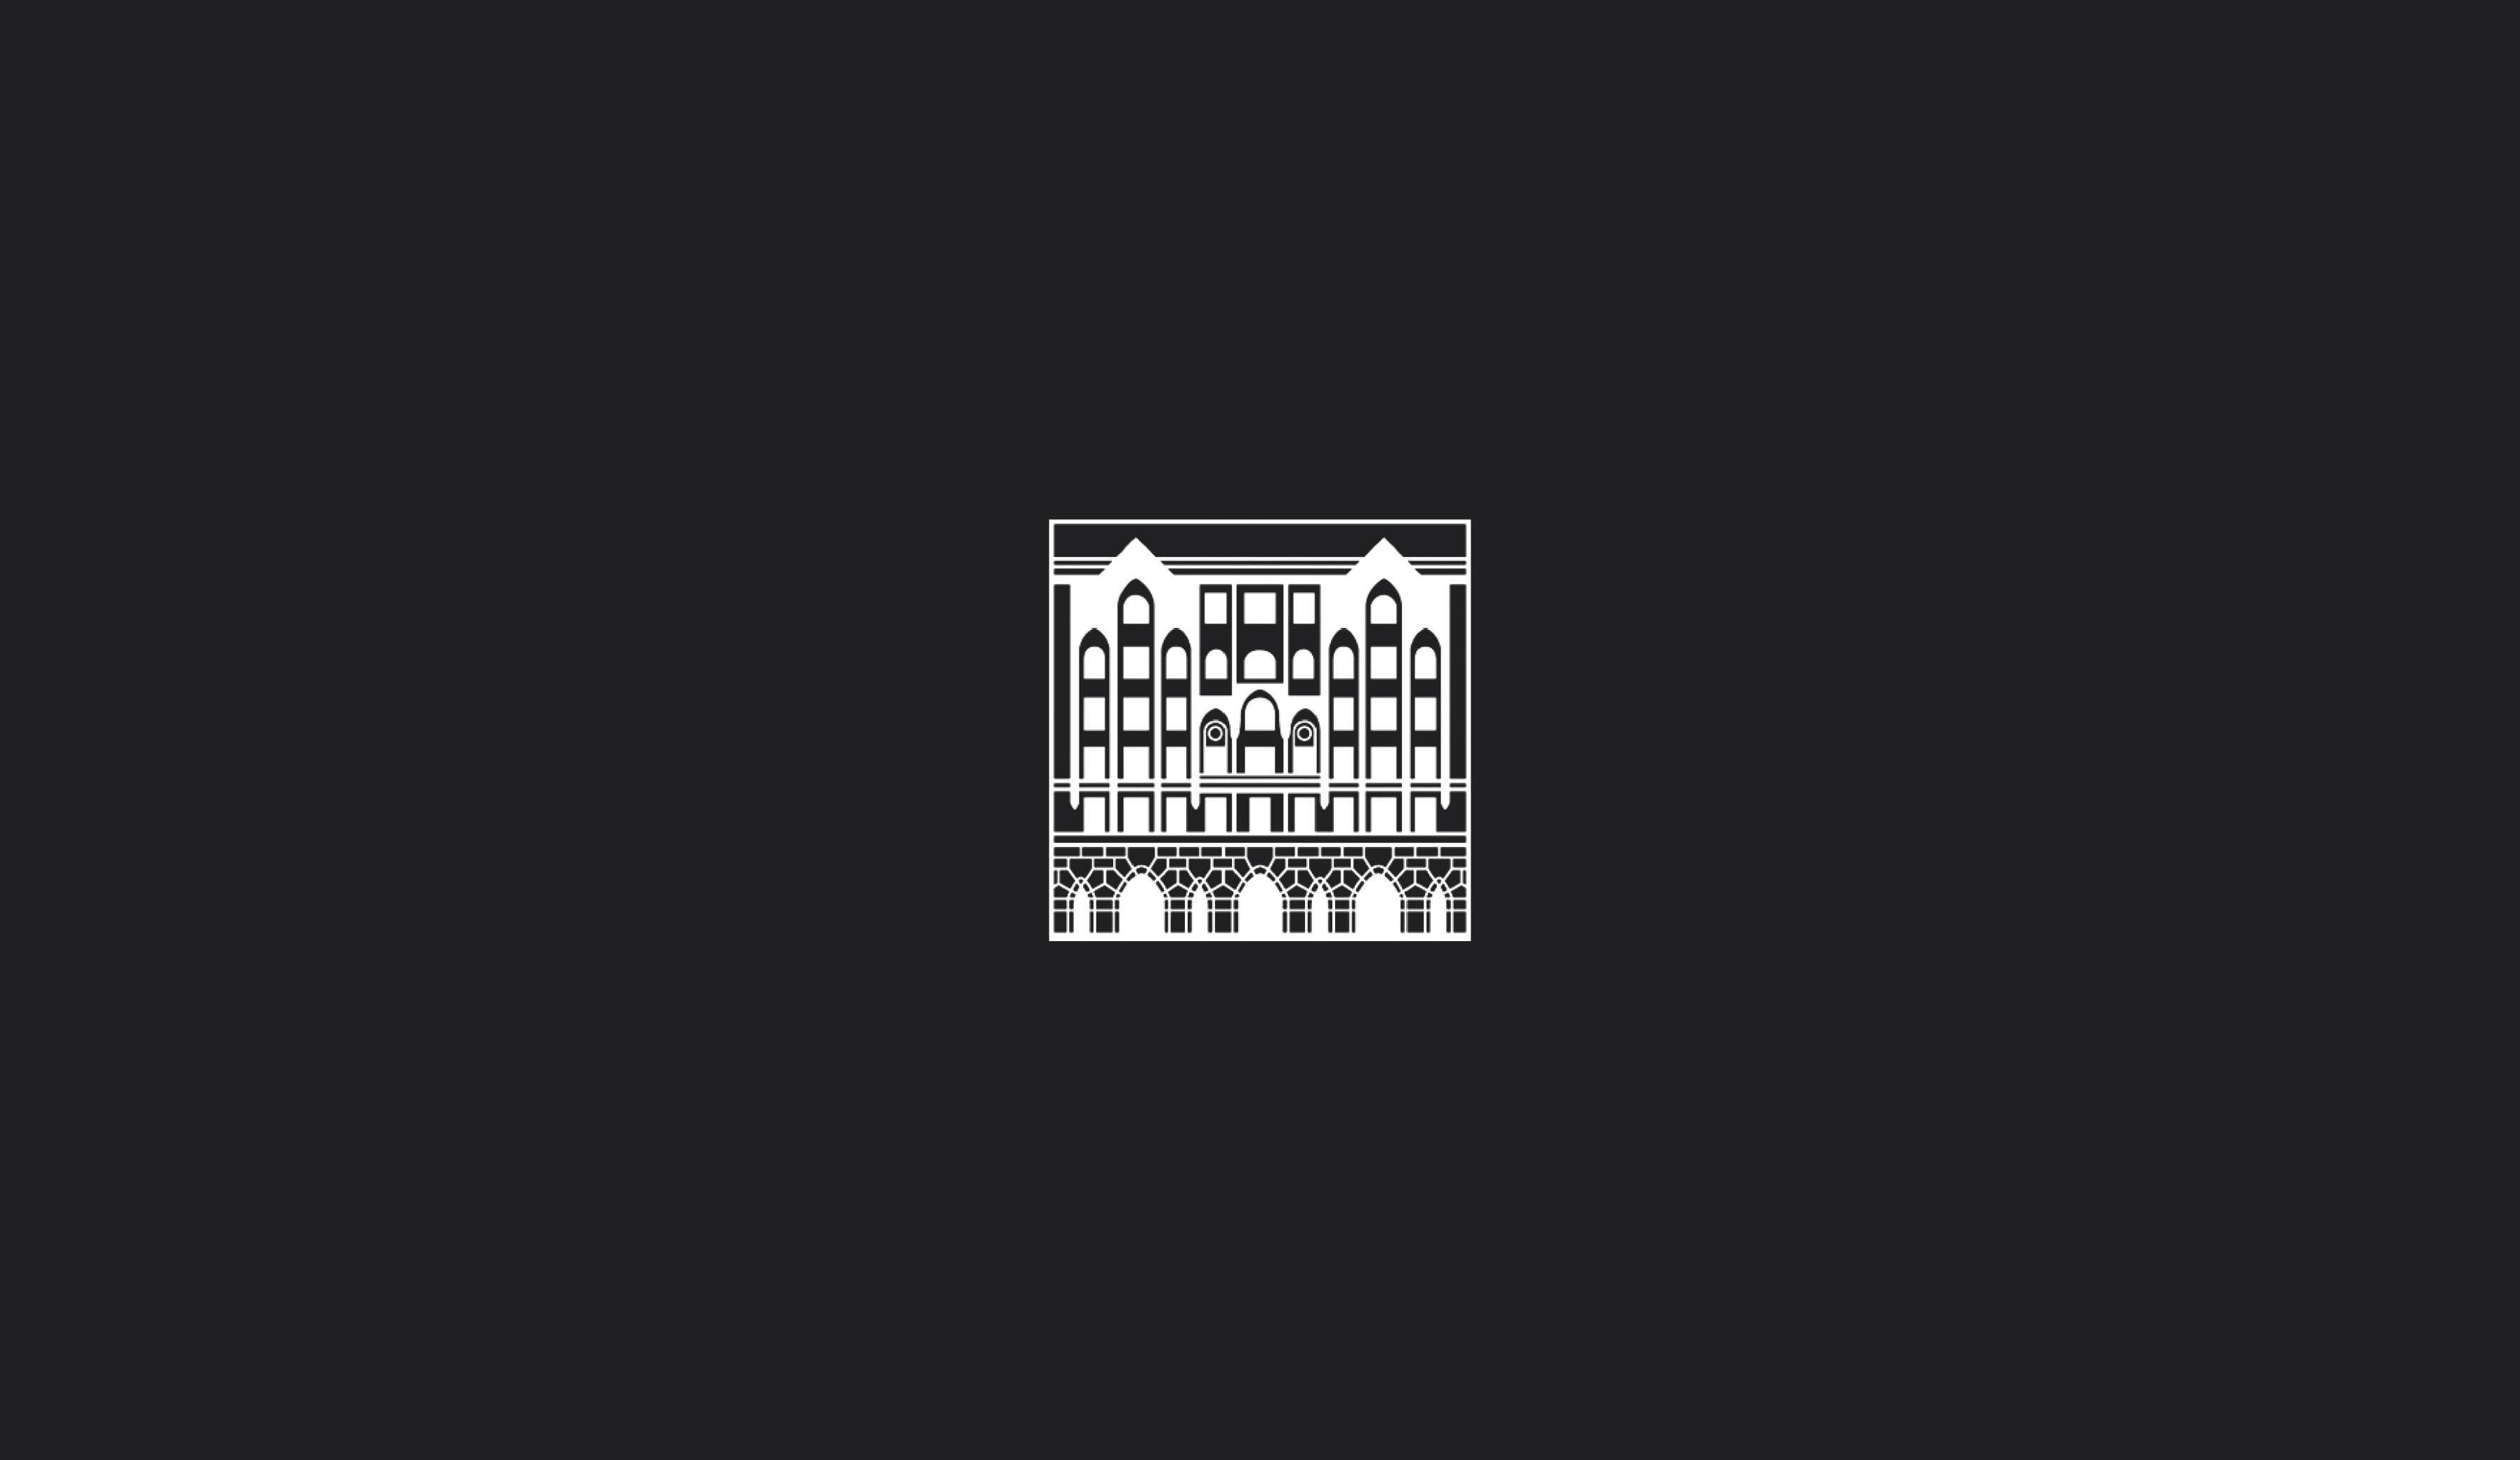 Rebirth of St Petersburg logo design